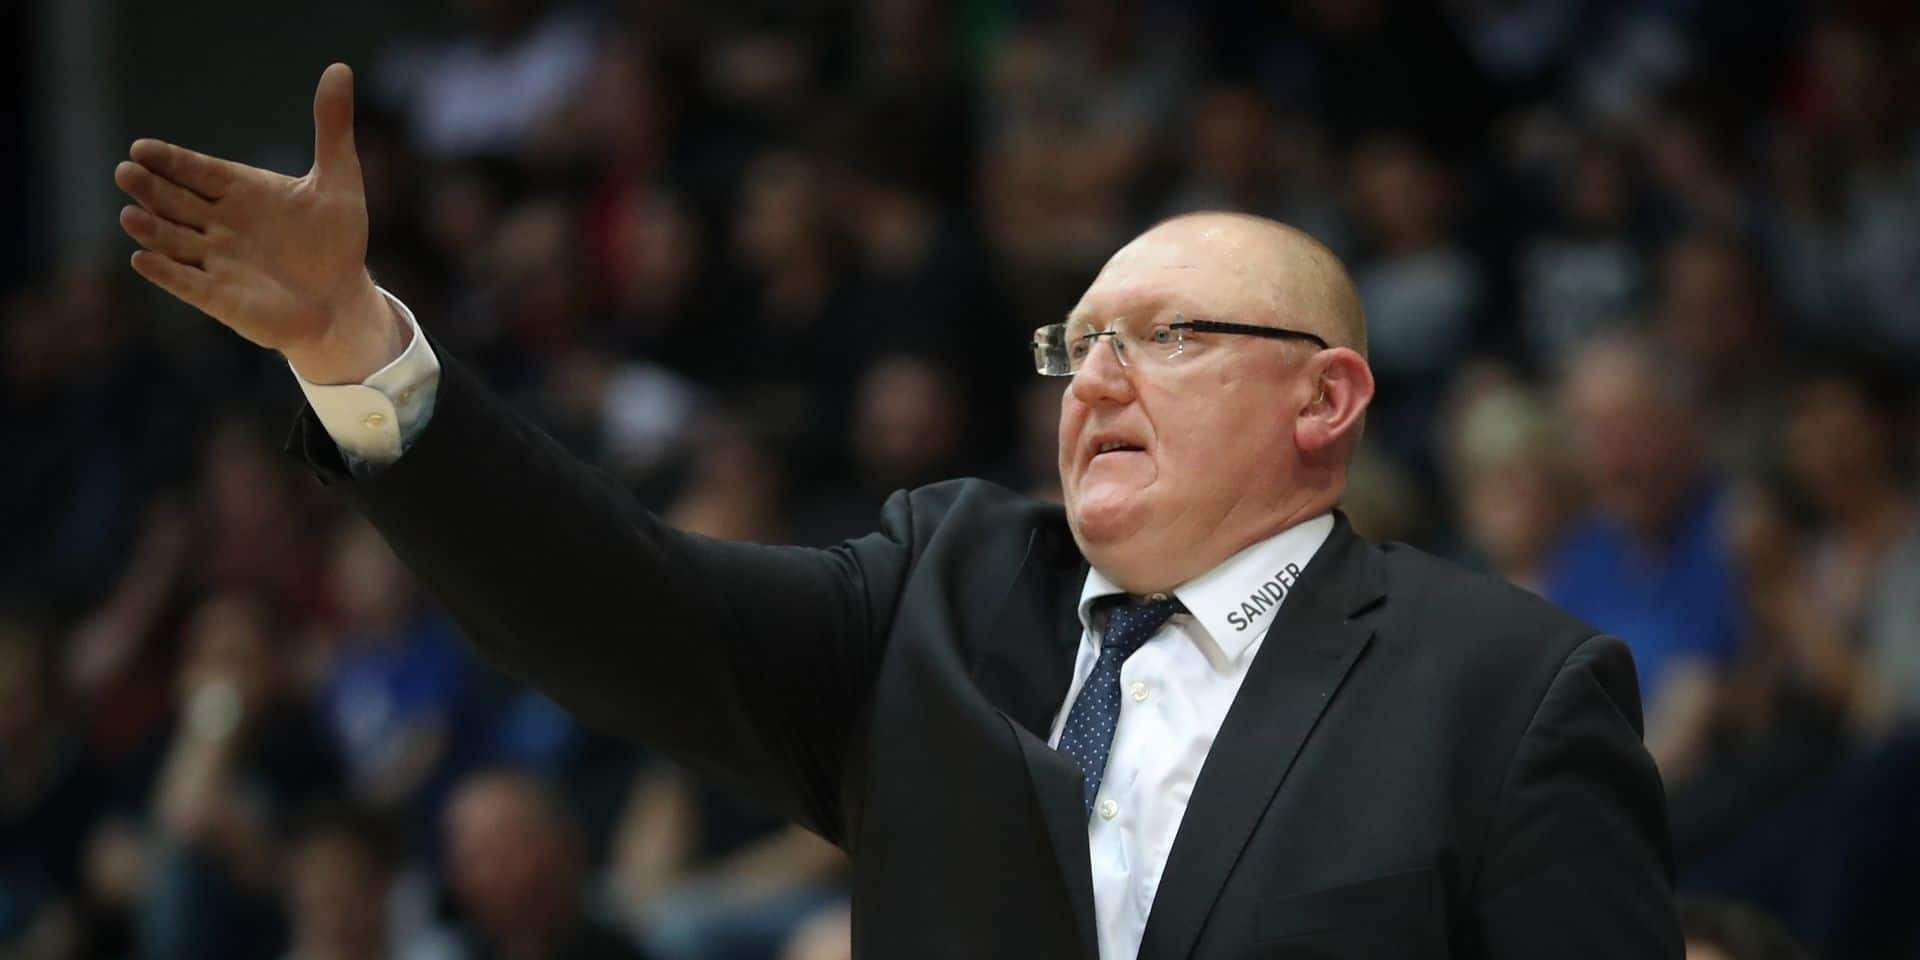 Basket: Mons prend sa revanche sur le Brussels, Alost a souffert à Willebroek